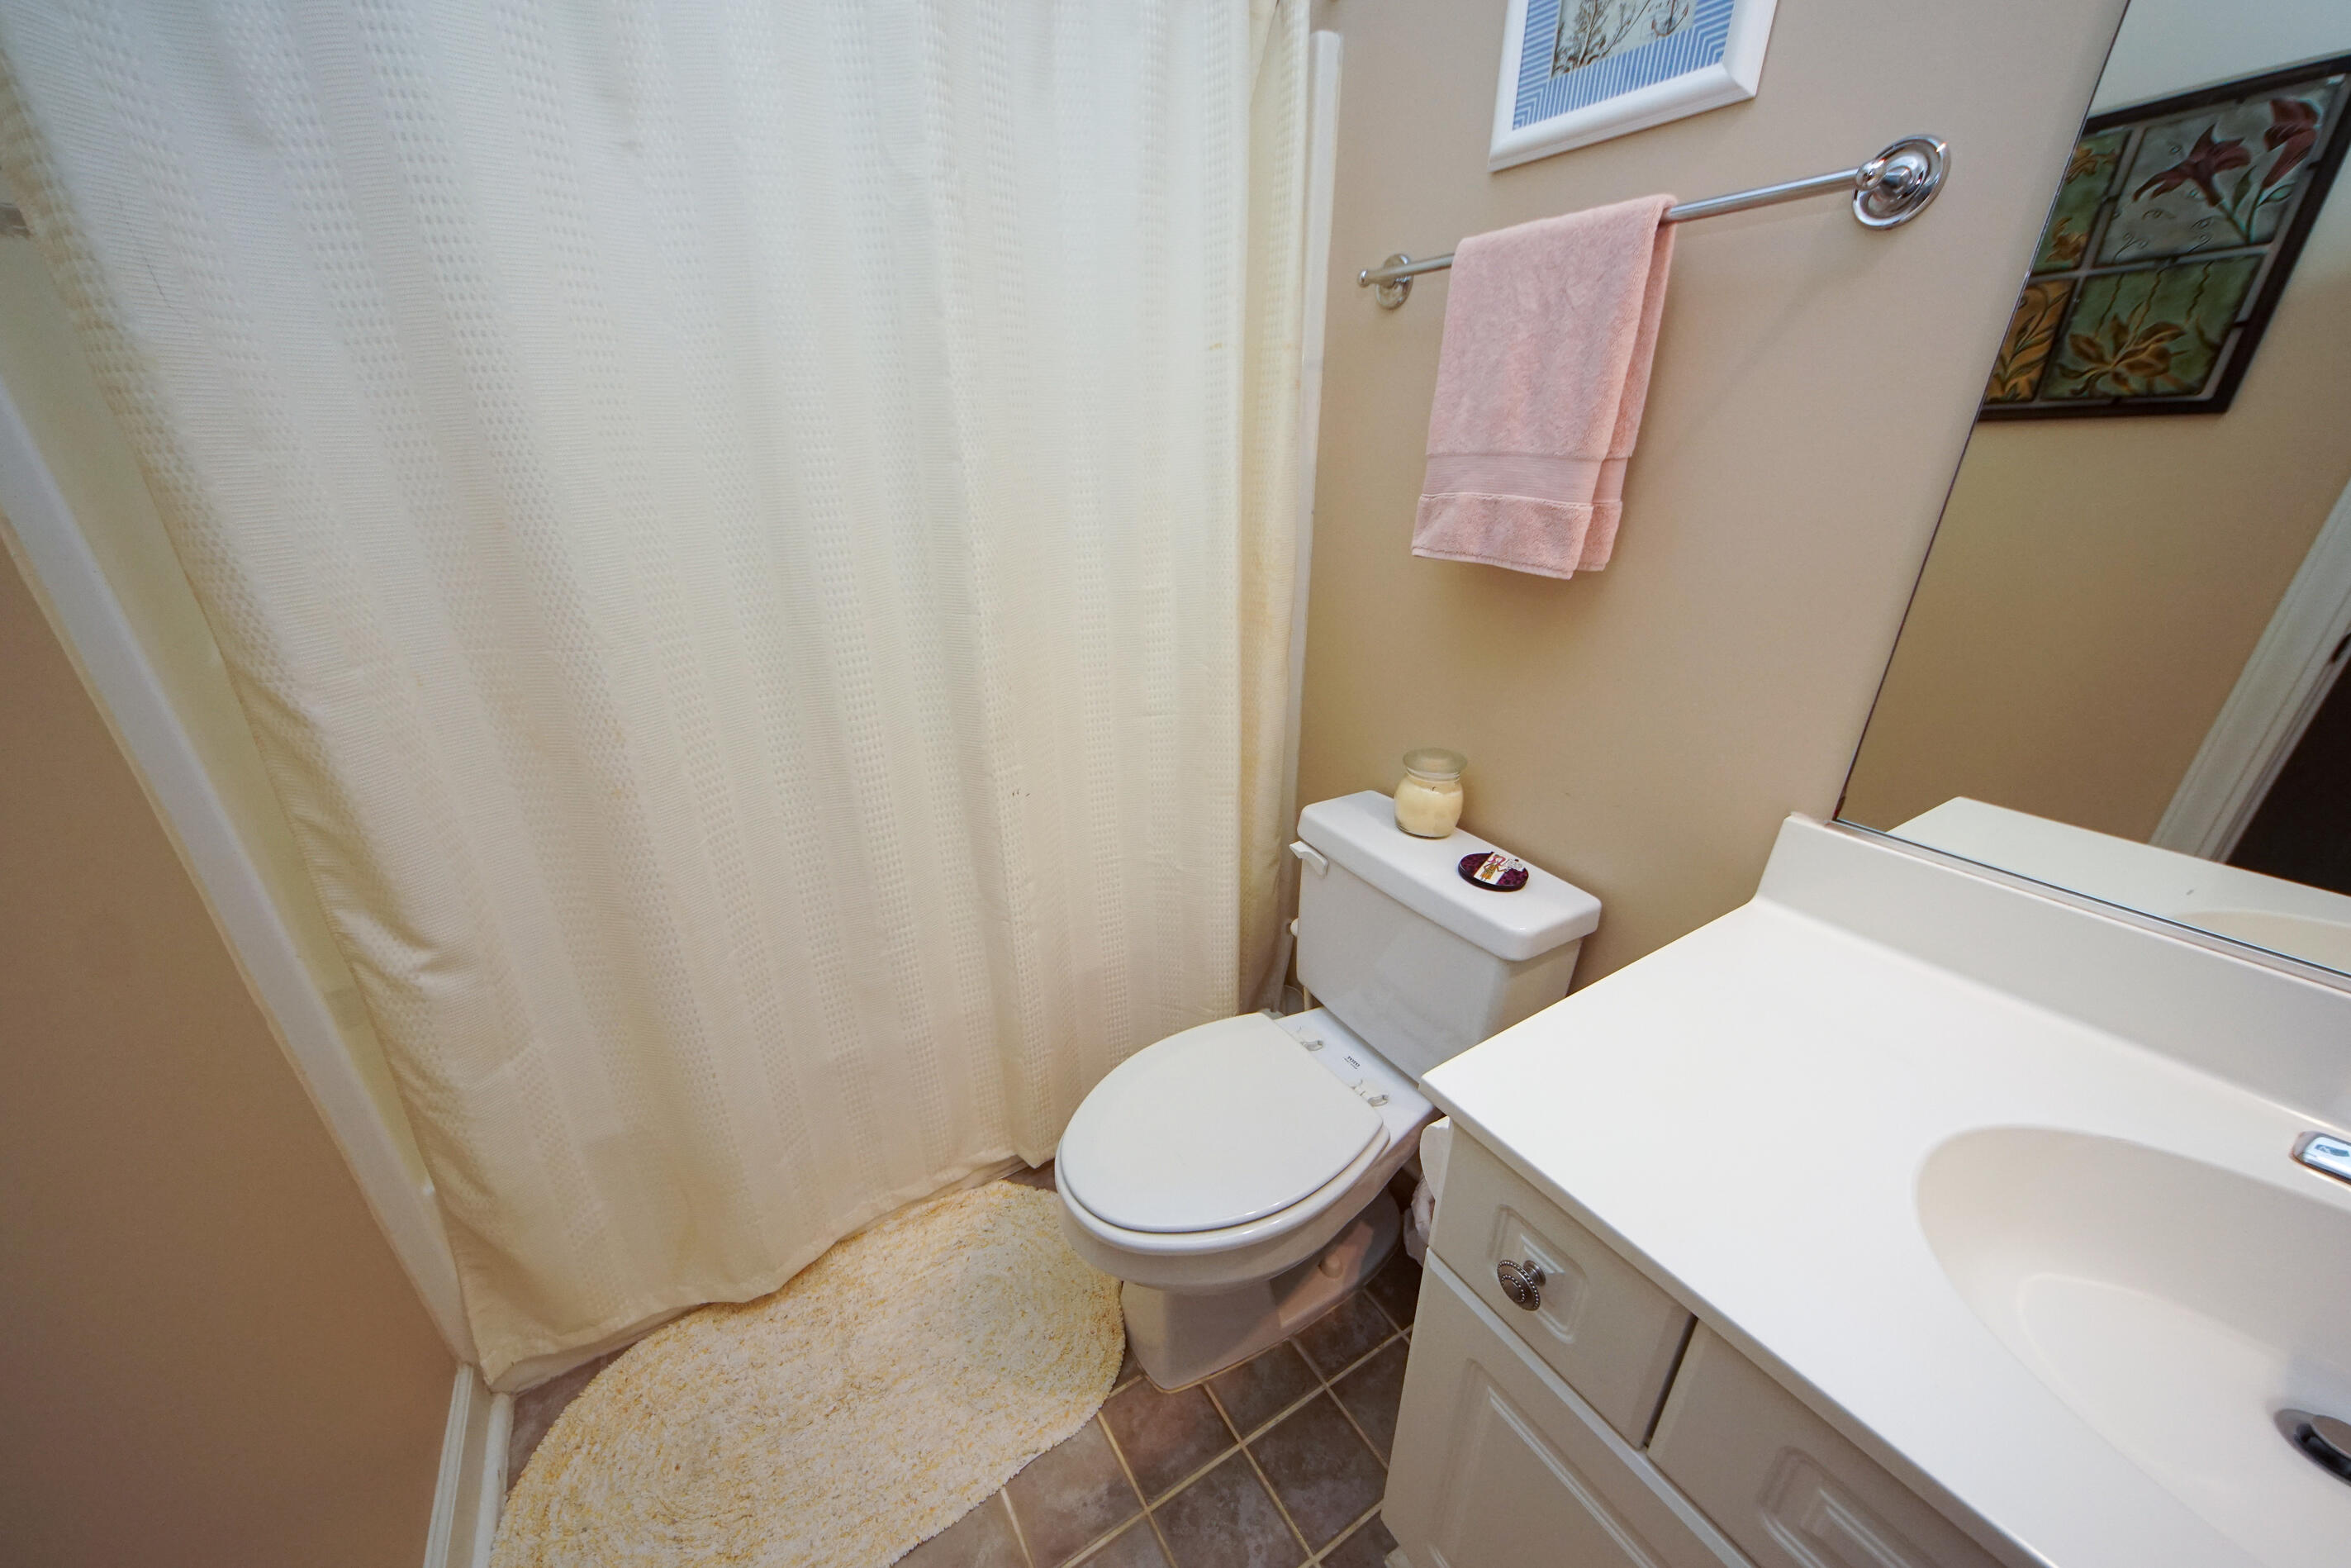 Dunes West Homes For Sale - 1631 Camfield, Mount Pleasant, SC - 29